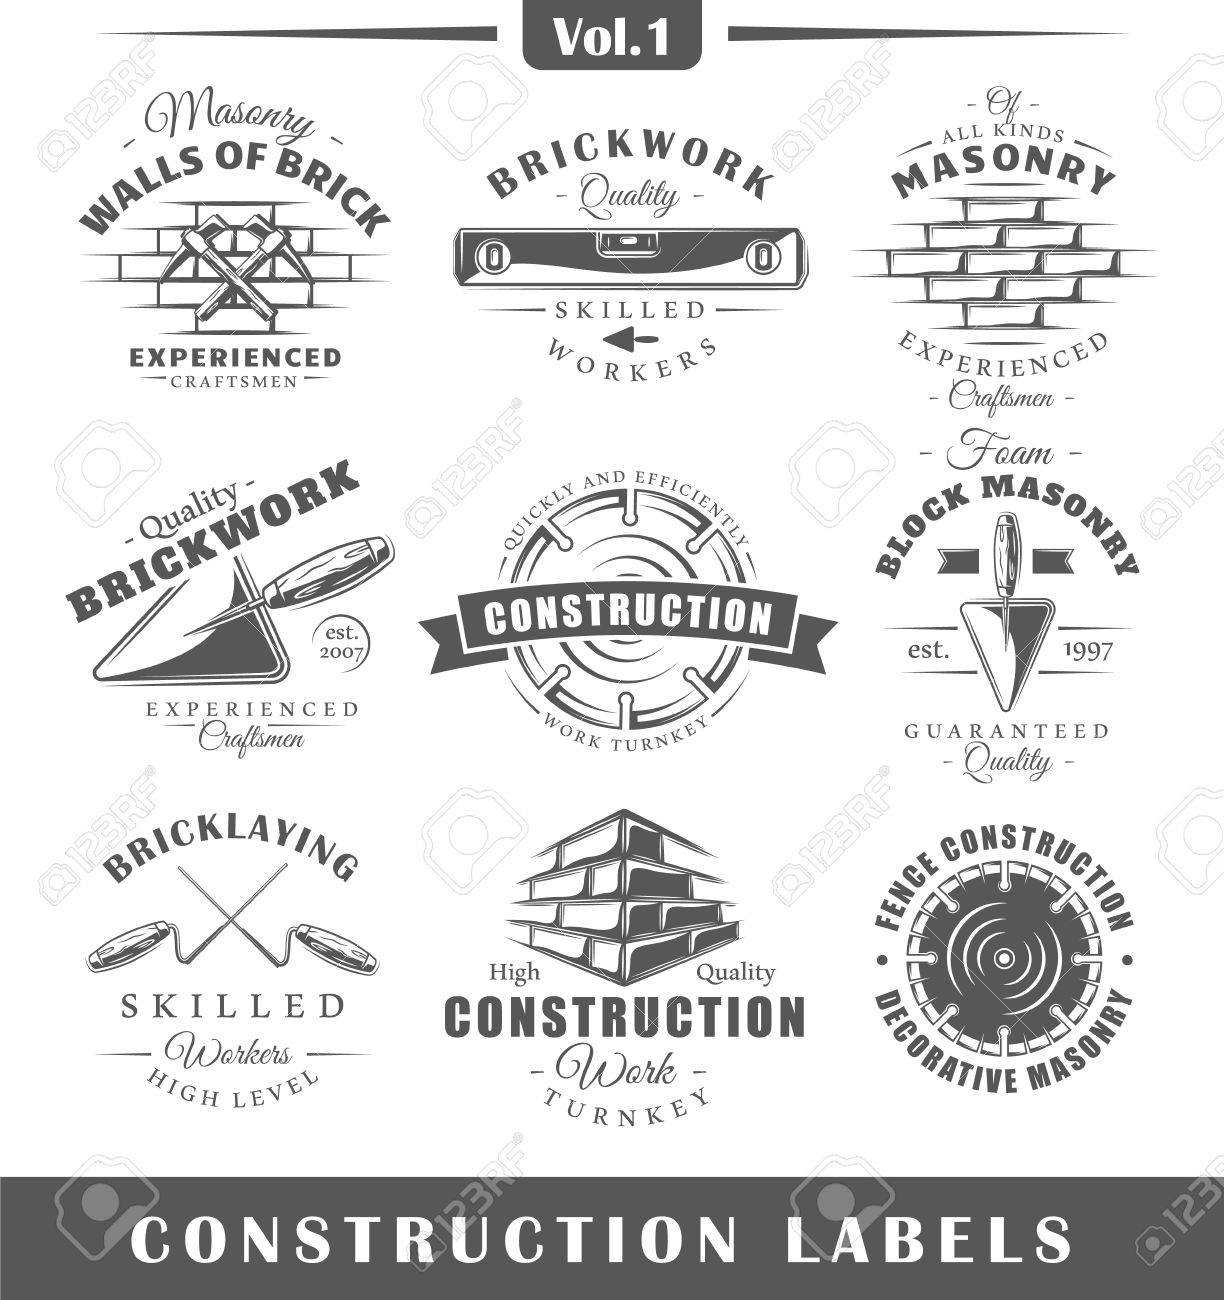 Set of vintage construction labels. Vol.1. Posters, stamps, banners and design elements. Vector illustration - 72232125